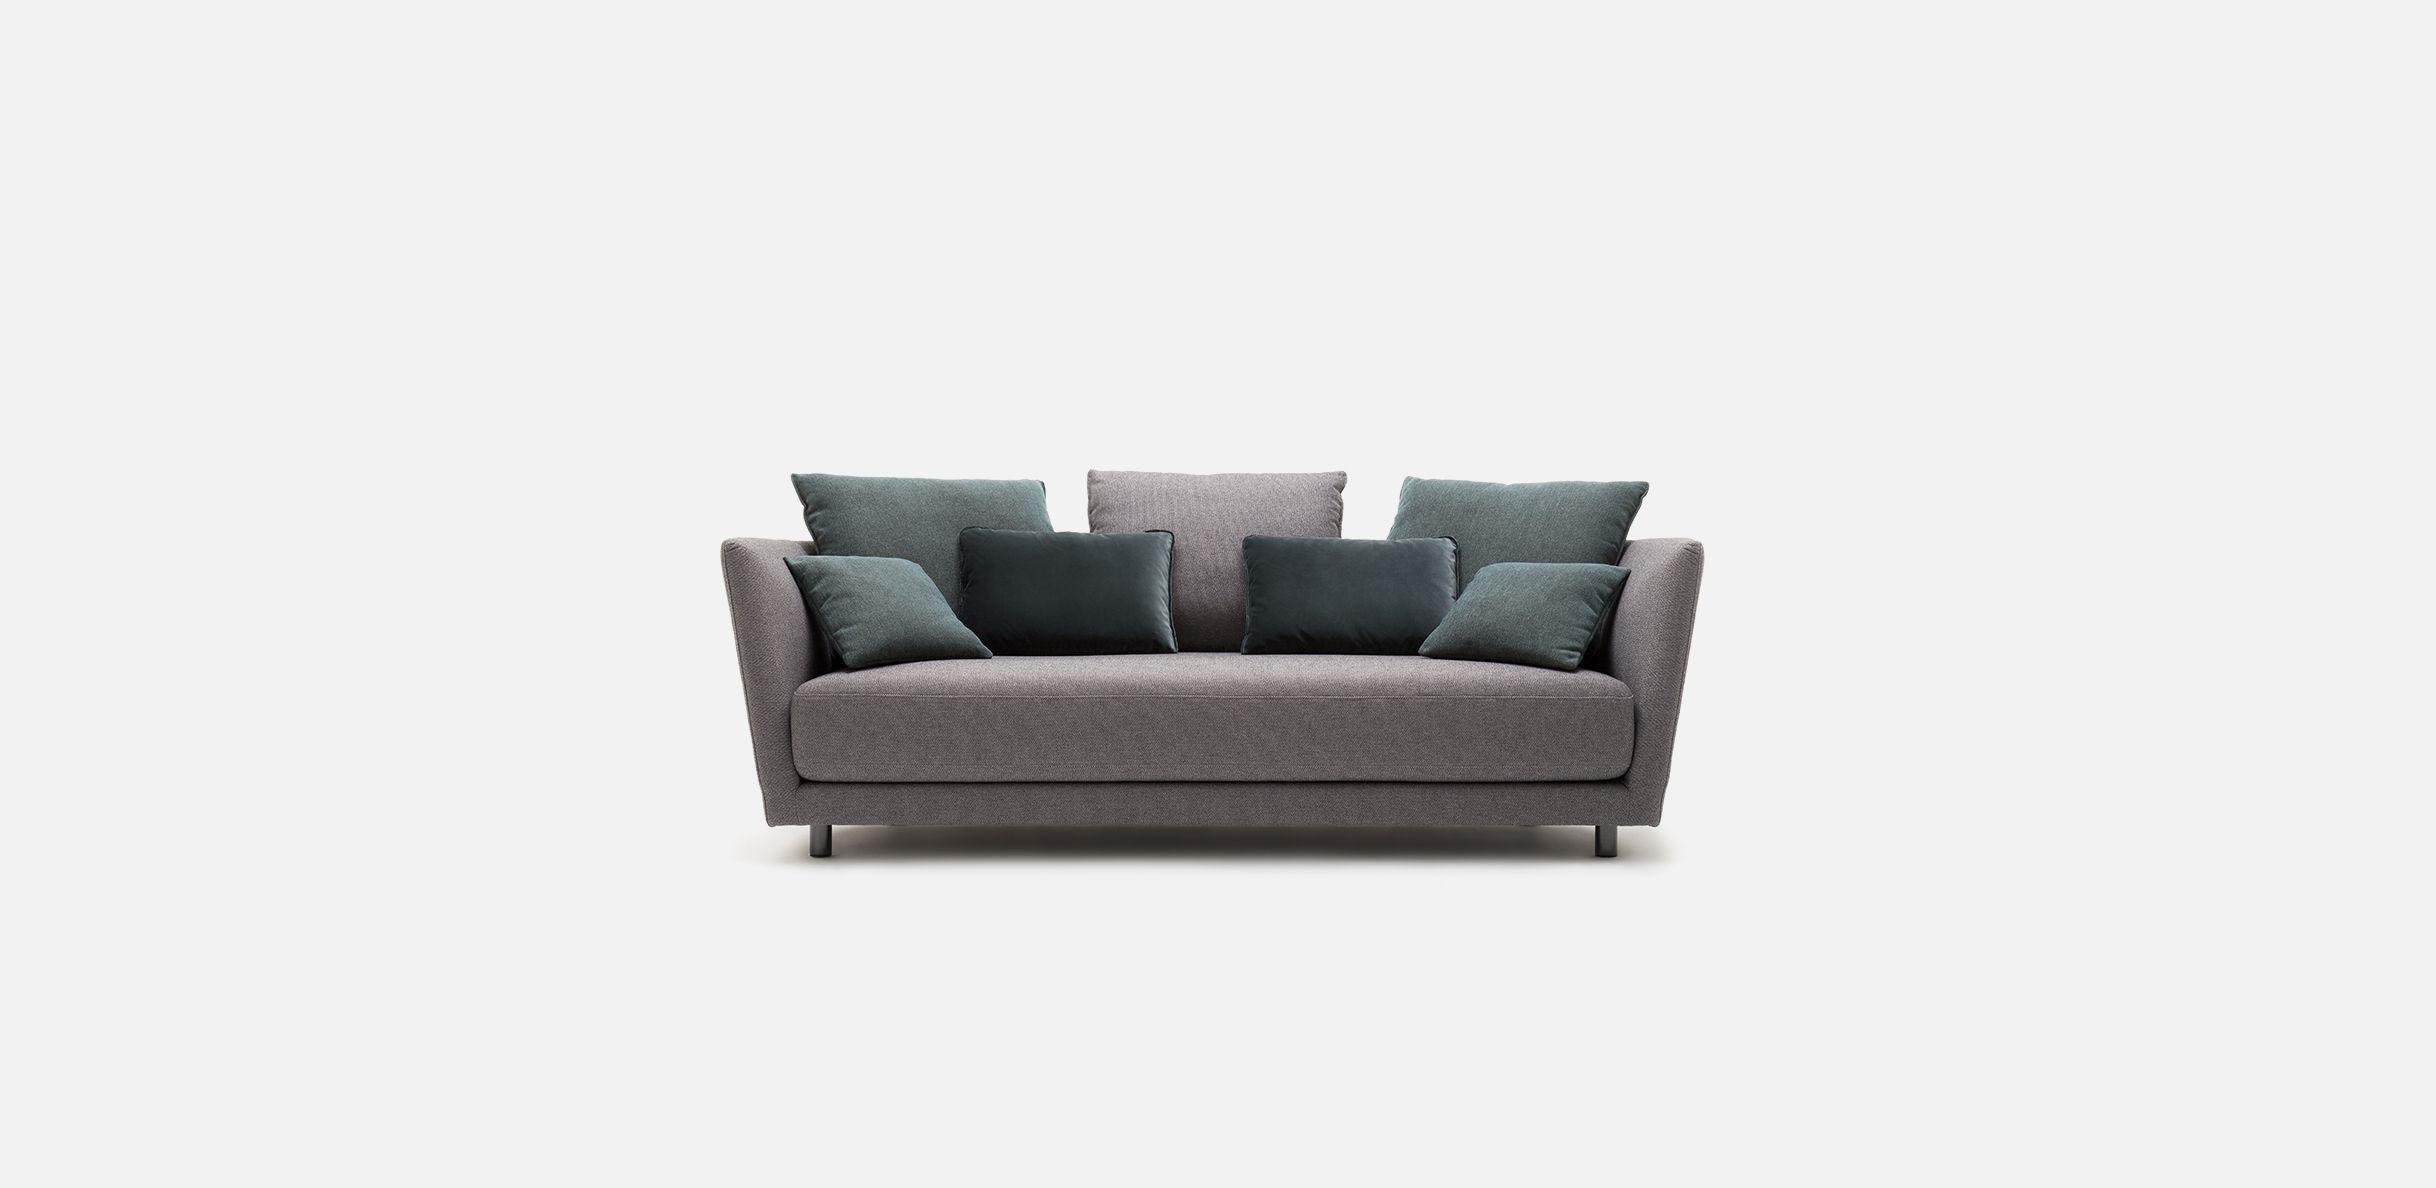 Rolf Benz TONDO. Perfect Seating. Perfect Lounging. #sofa